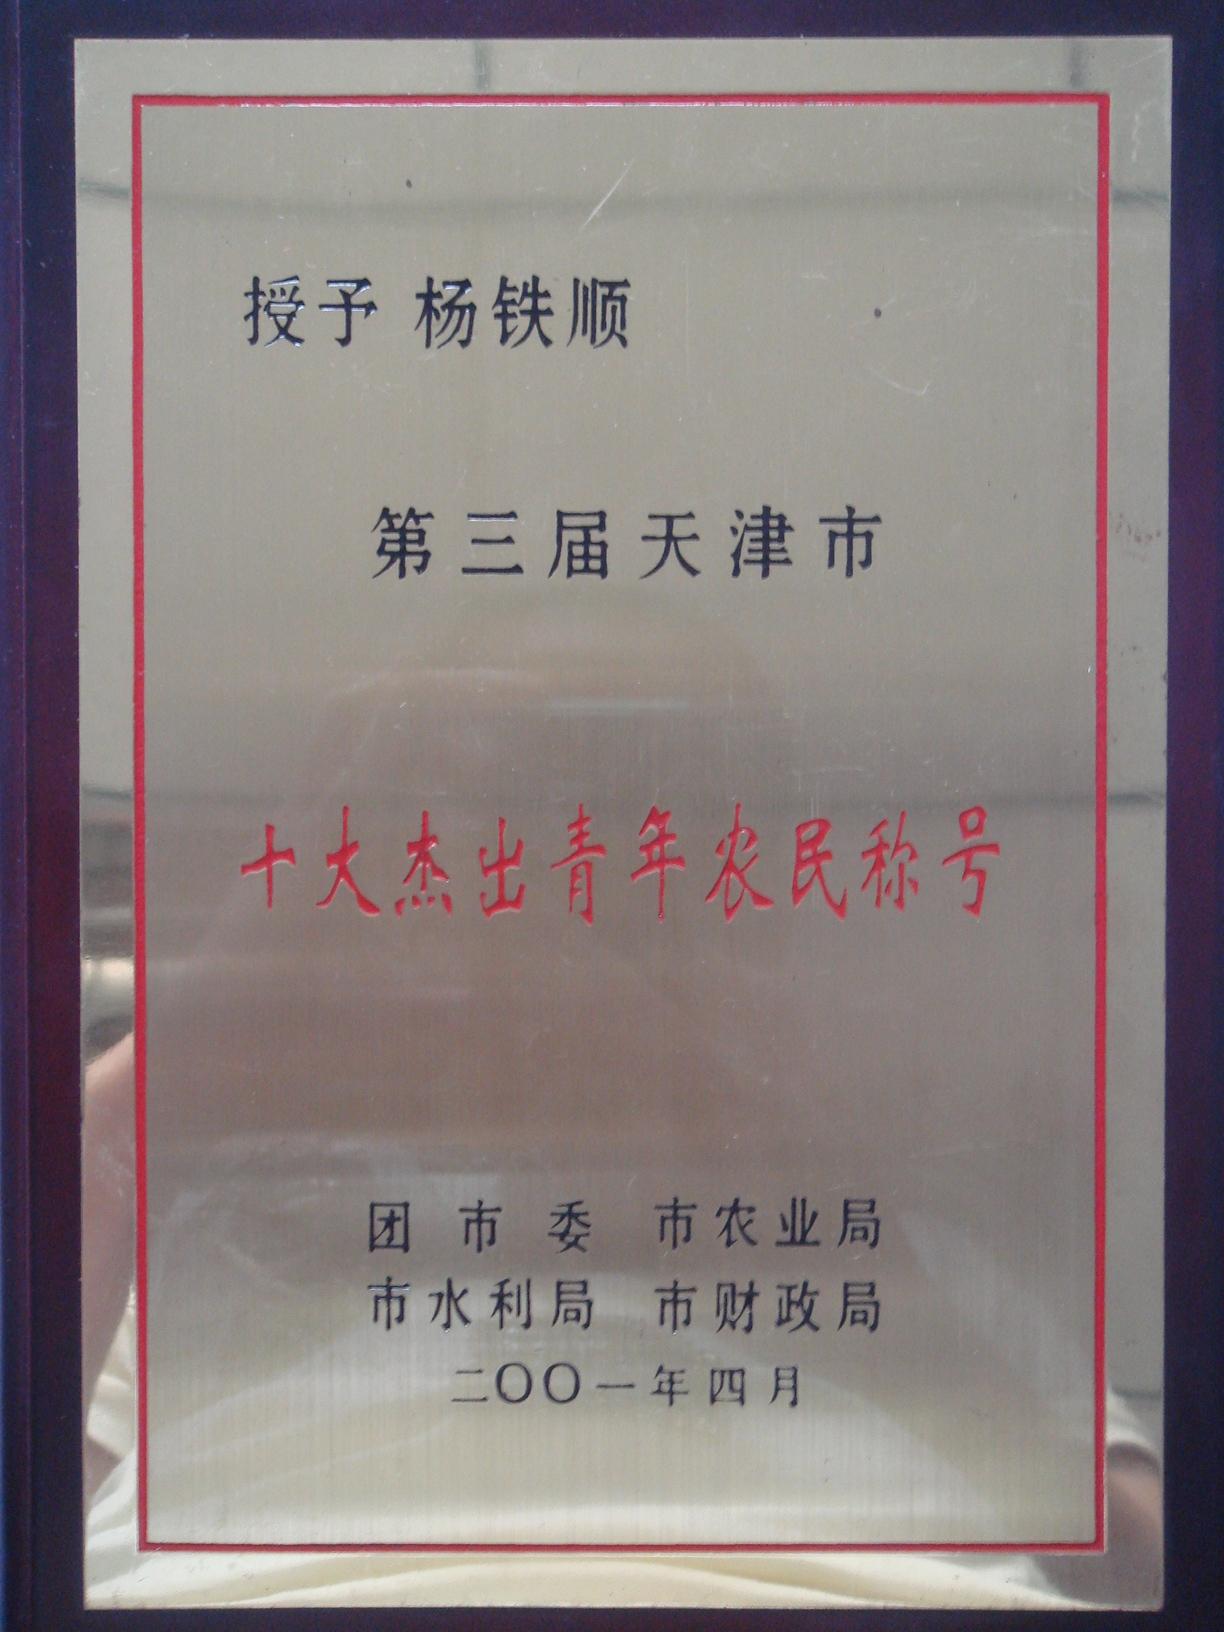 "<div style=""text-align:center;""> 天津市十大杰出 </div> <div style=""text-align:center;""> 青年农民 </div>"